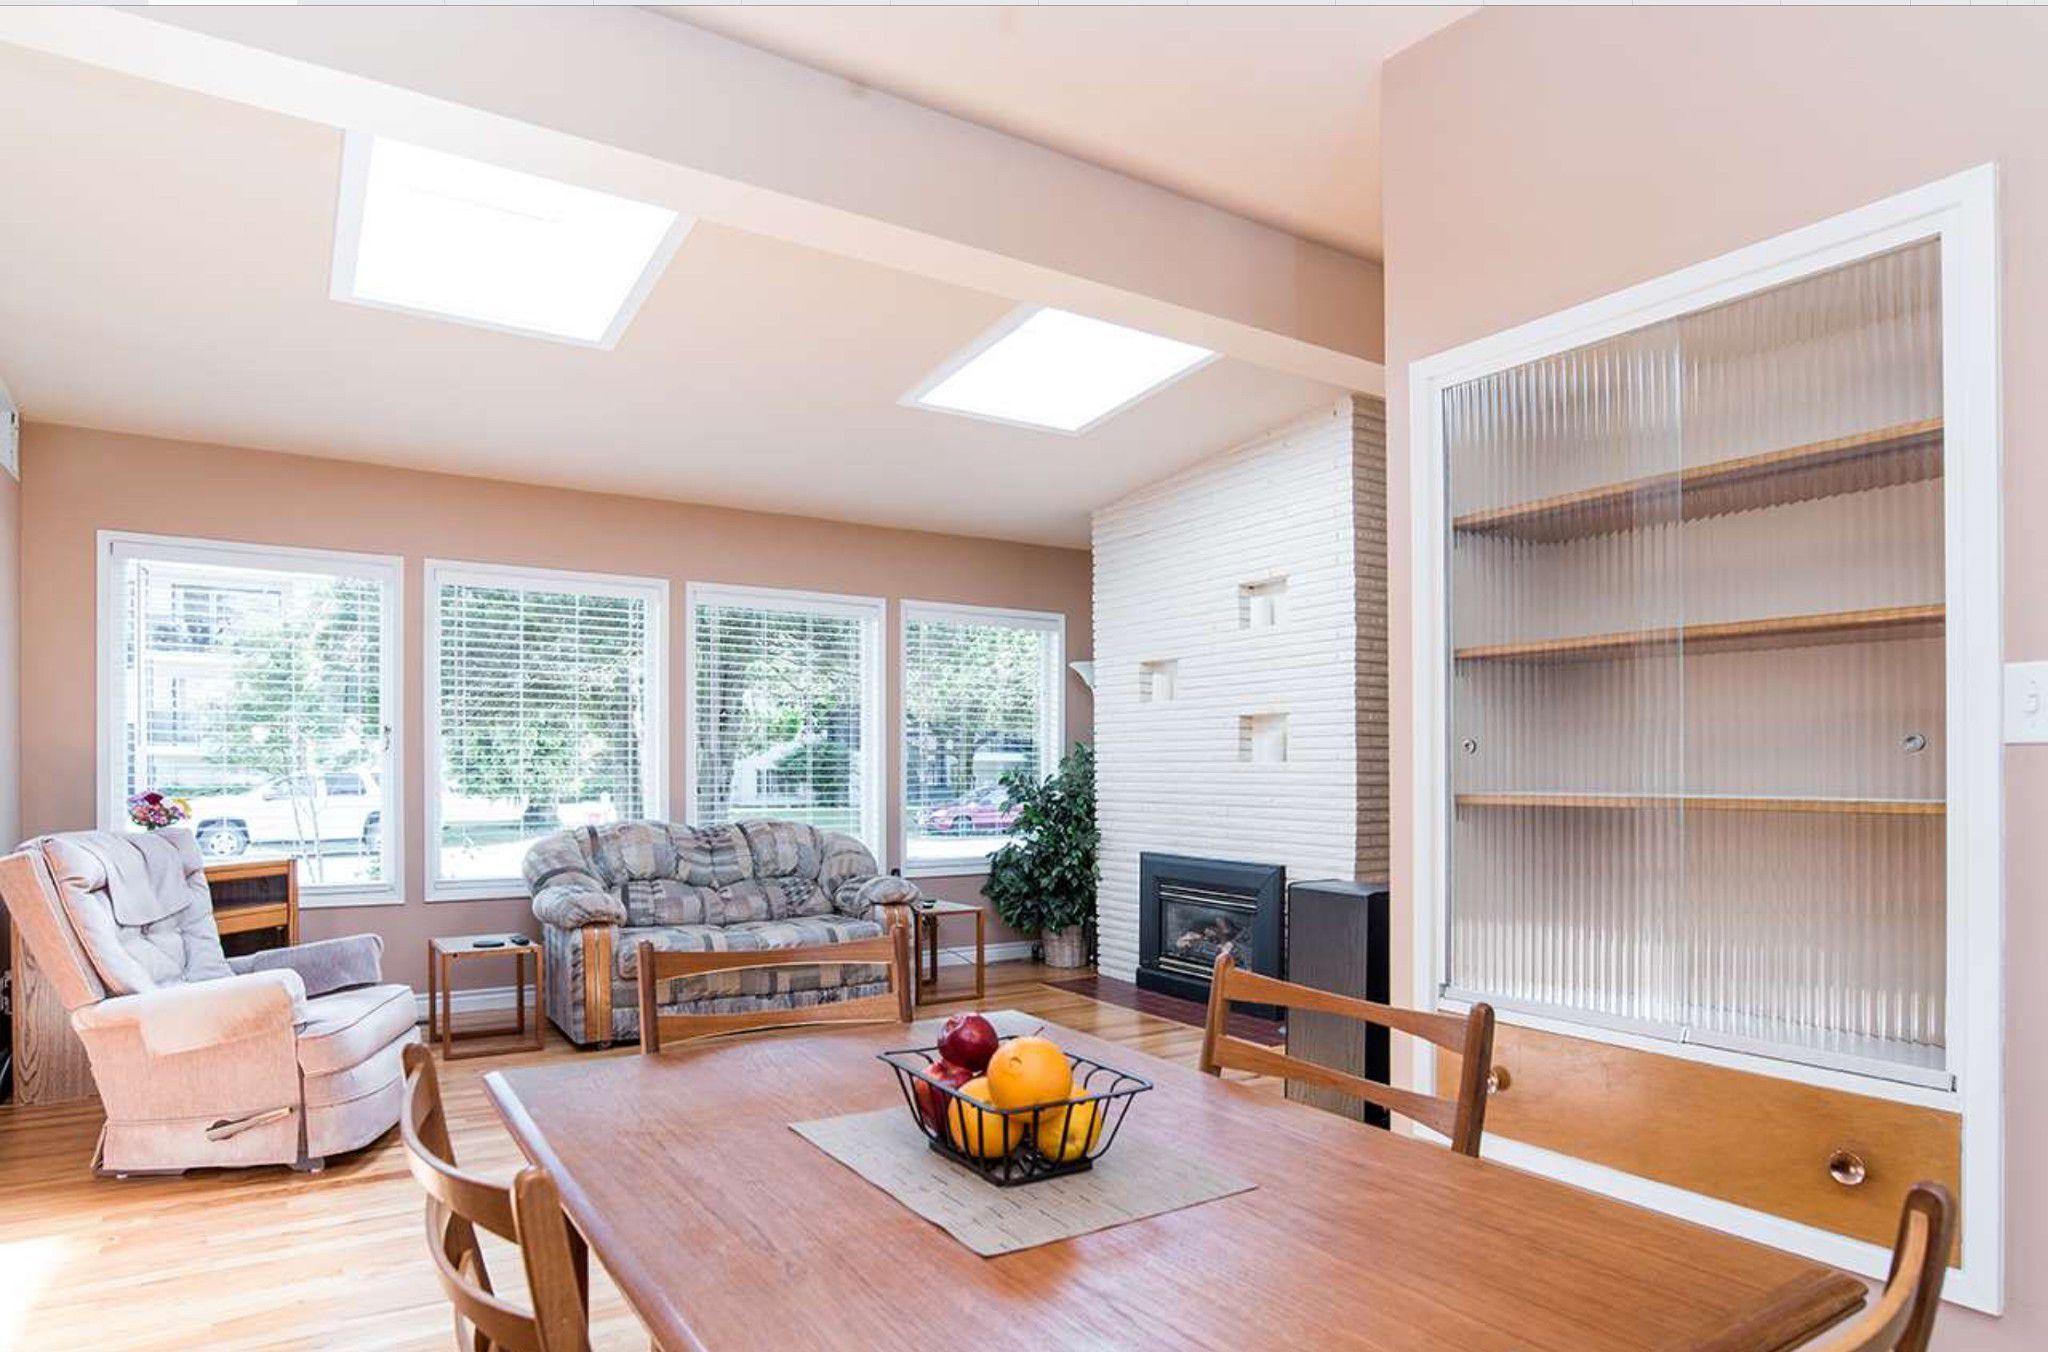 Photo 5: Photos: 10327 127A Street in Surrey: Cedar Hills House for sale : MLS®# R2178137